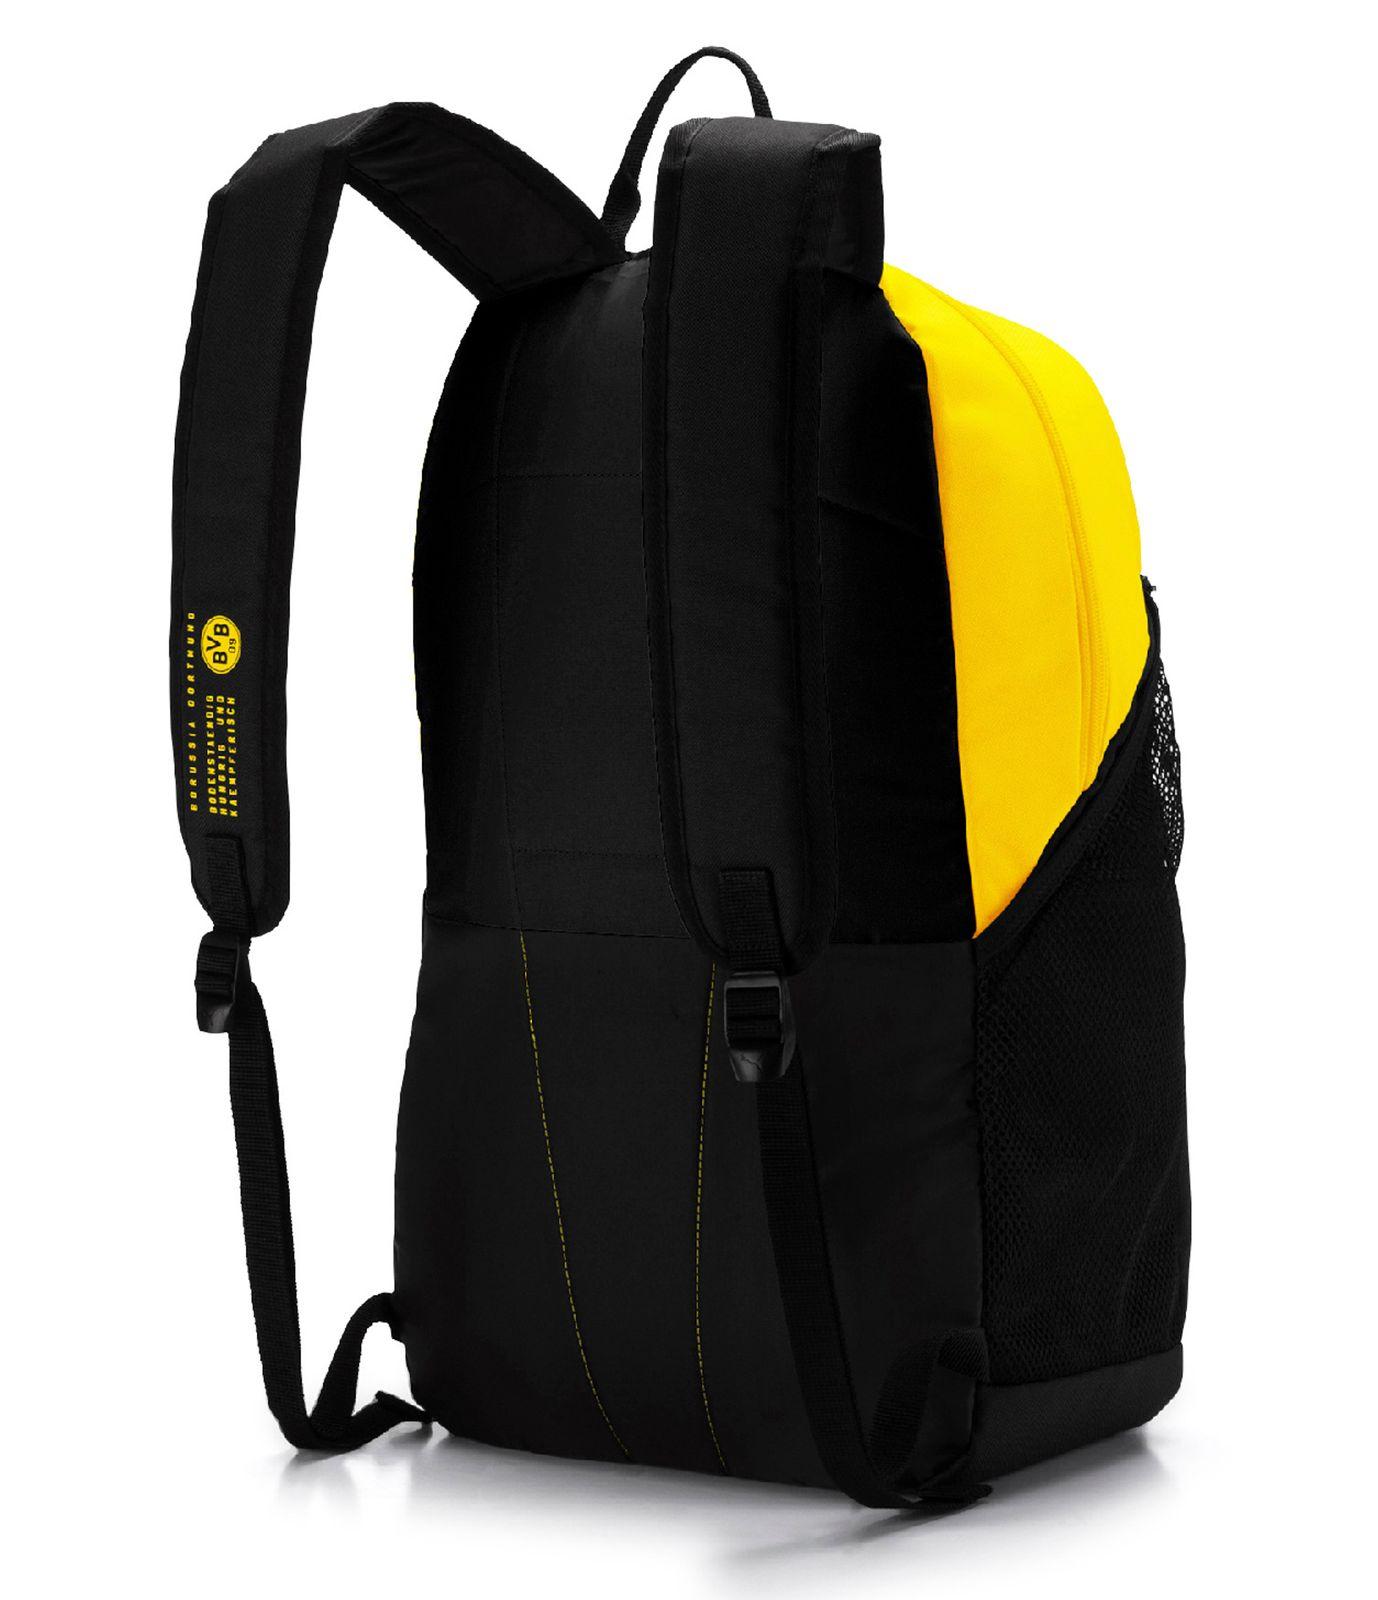 PUMA BVB Fan Backpack Puma Black Cyber Yellow